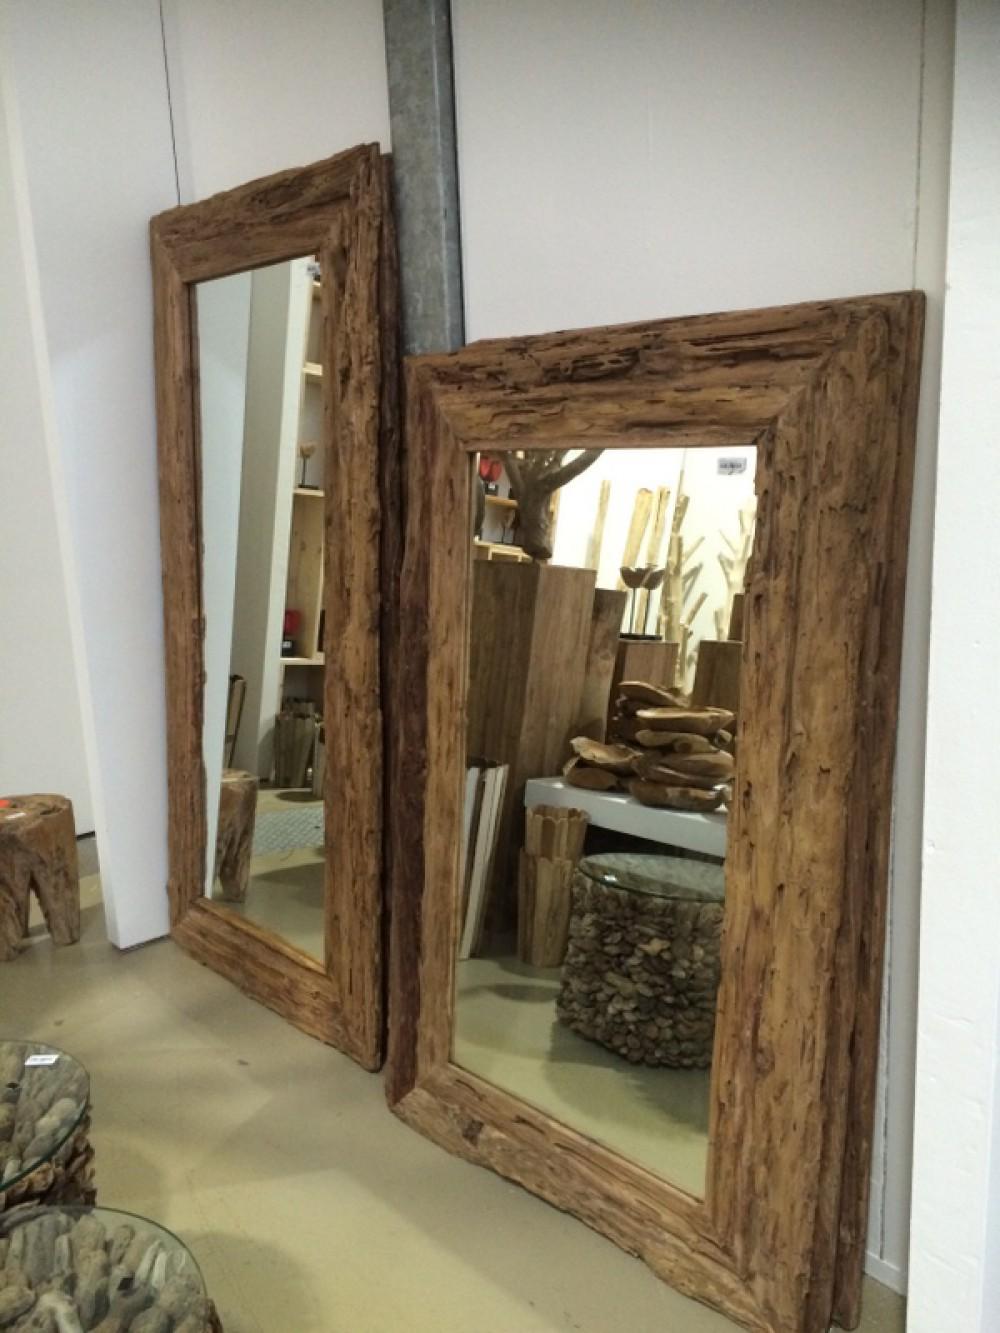 Spiegel teakholz recycled wandspiegel holzrahmen ma e 160 x 100 cm - Spiegel cm ...